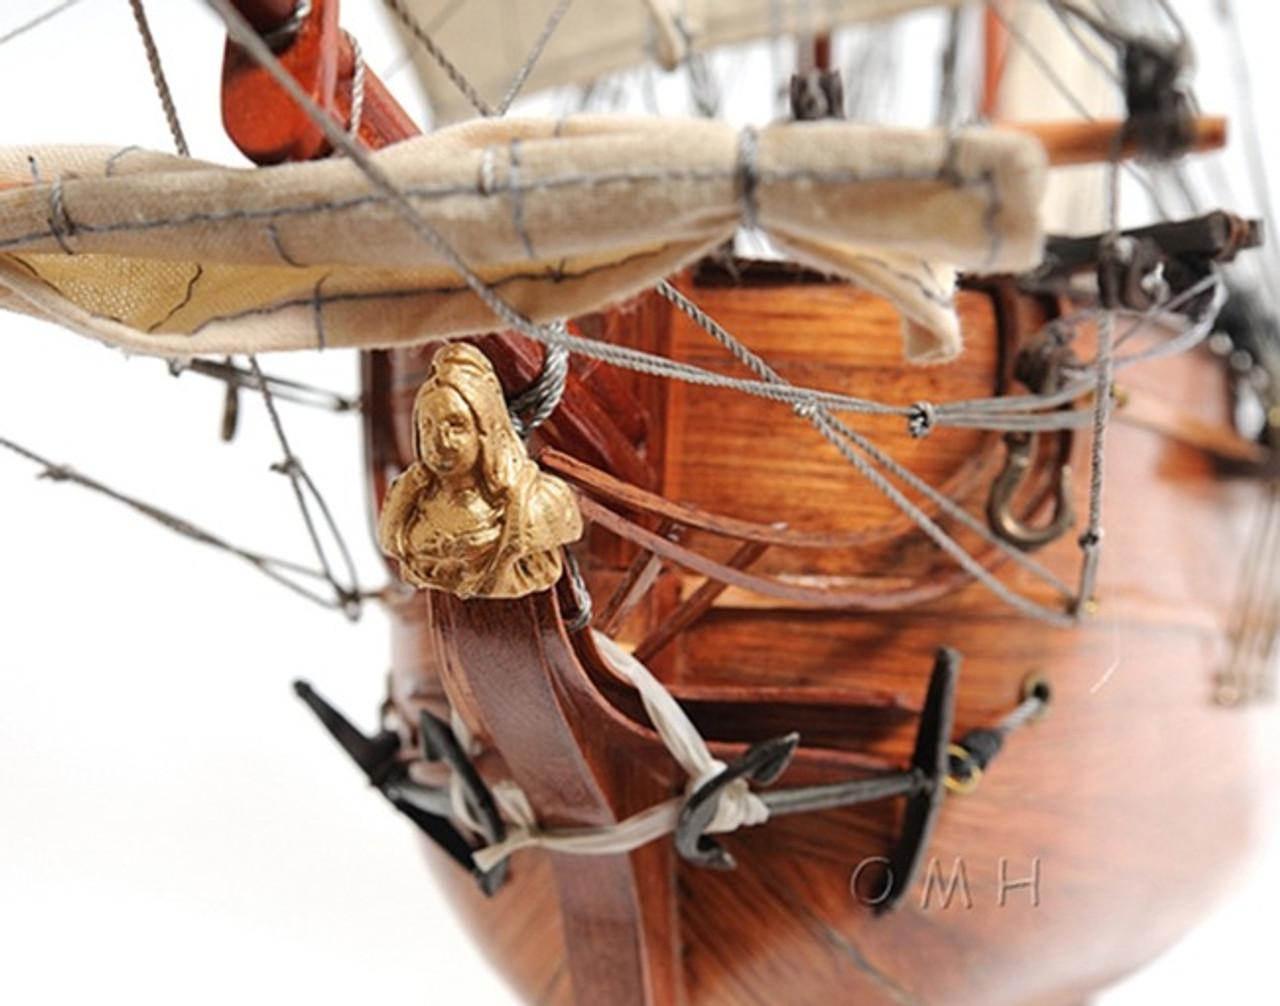 Brig Lady Washington Model Tall Pirate Ship